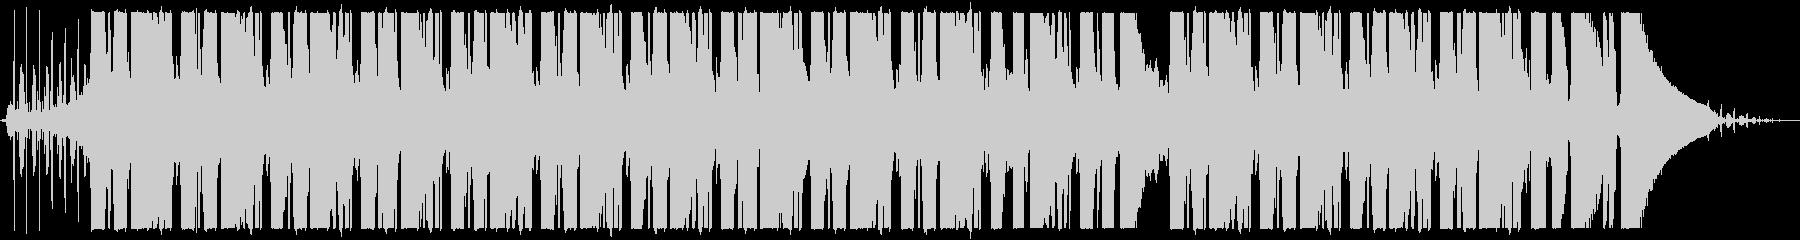 lo-fi楽曲 全編にノイズ入りの未再生の波形